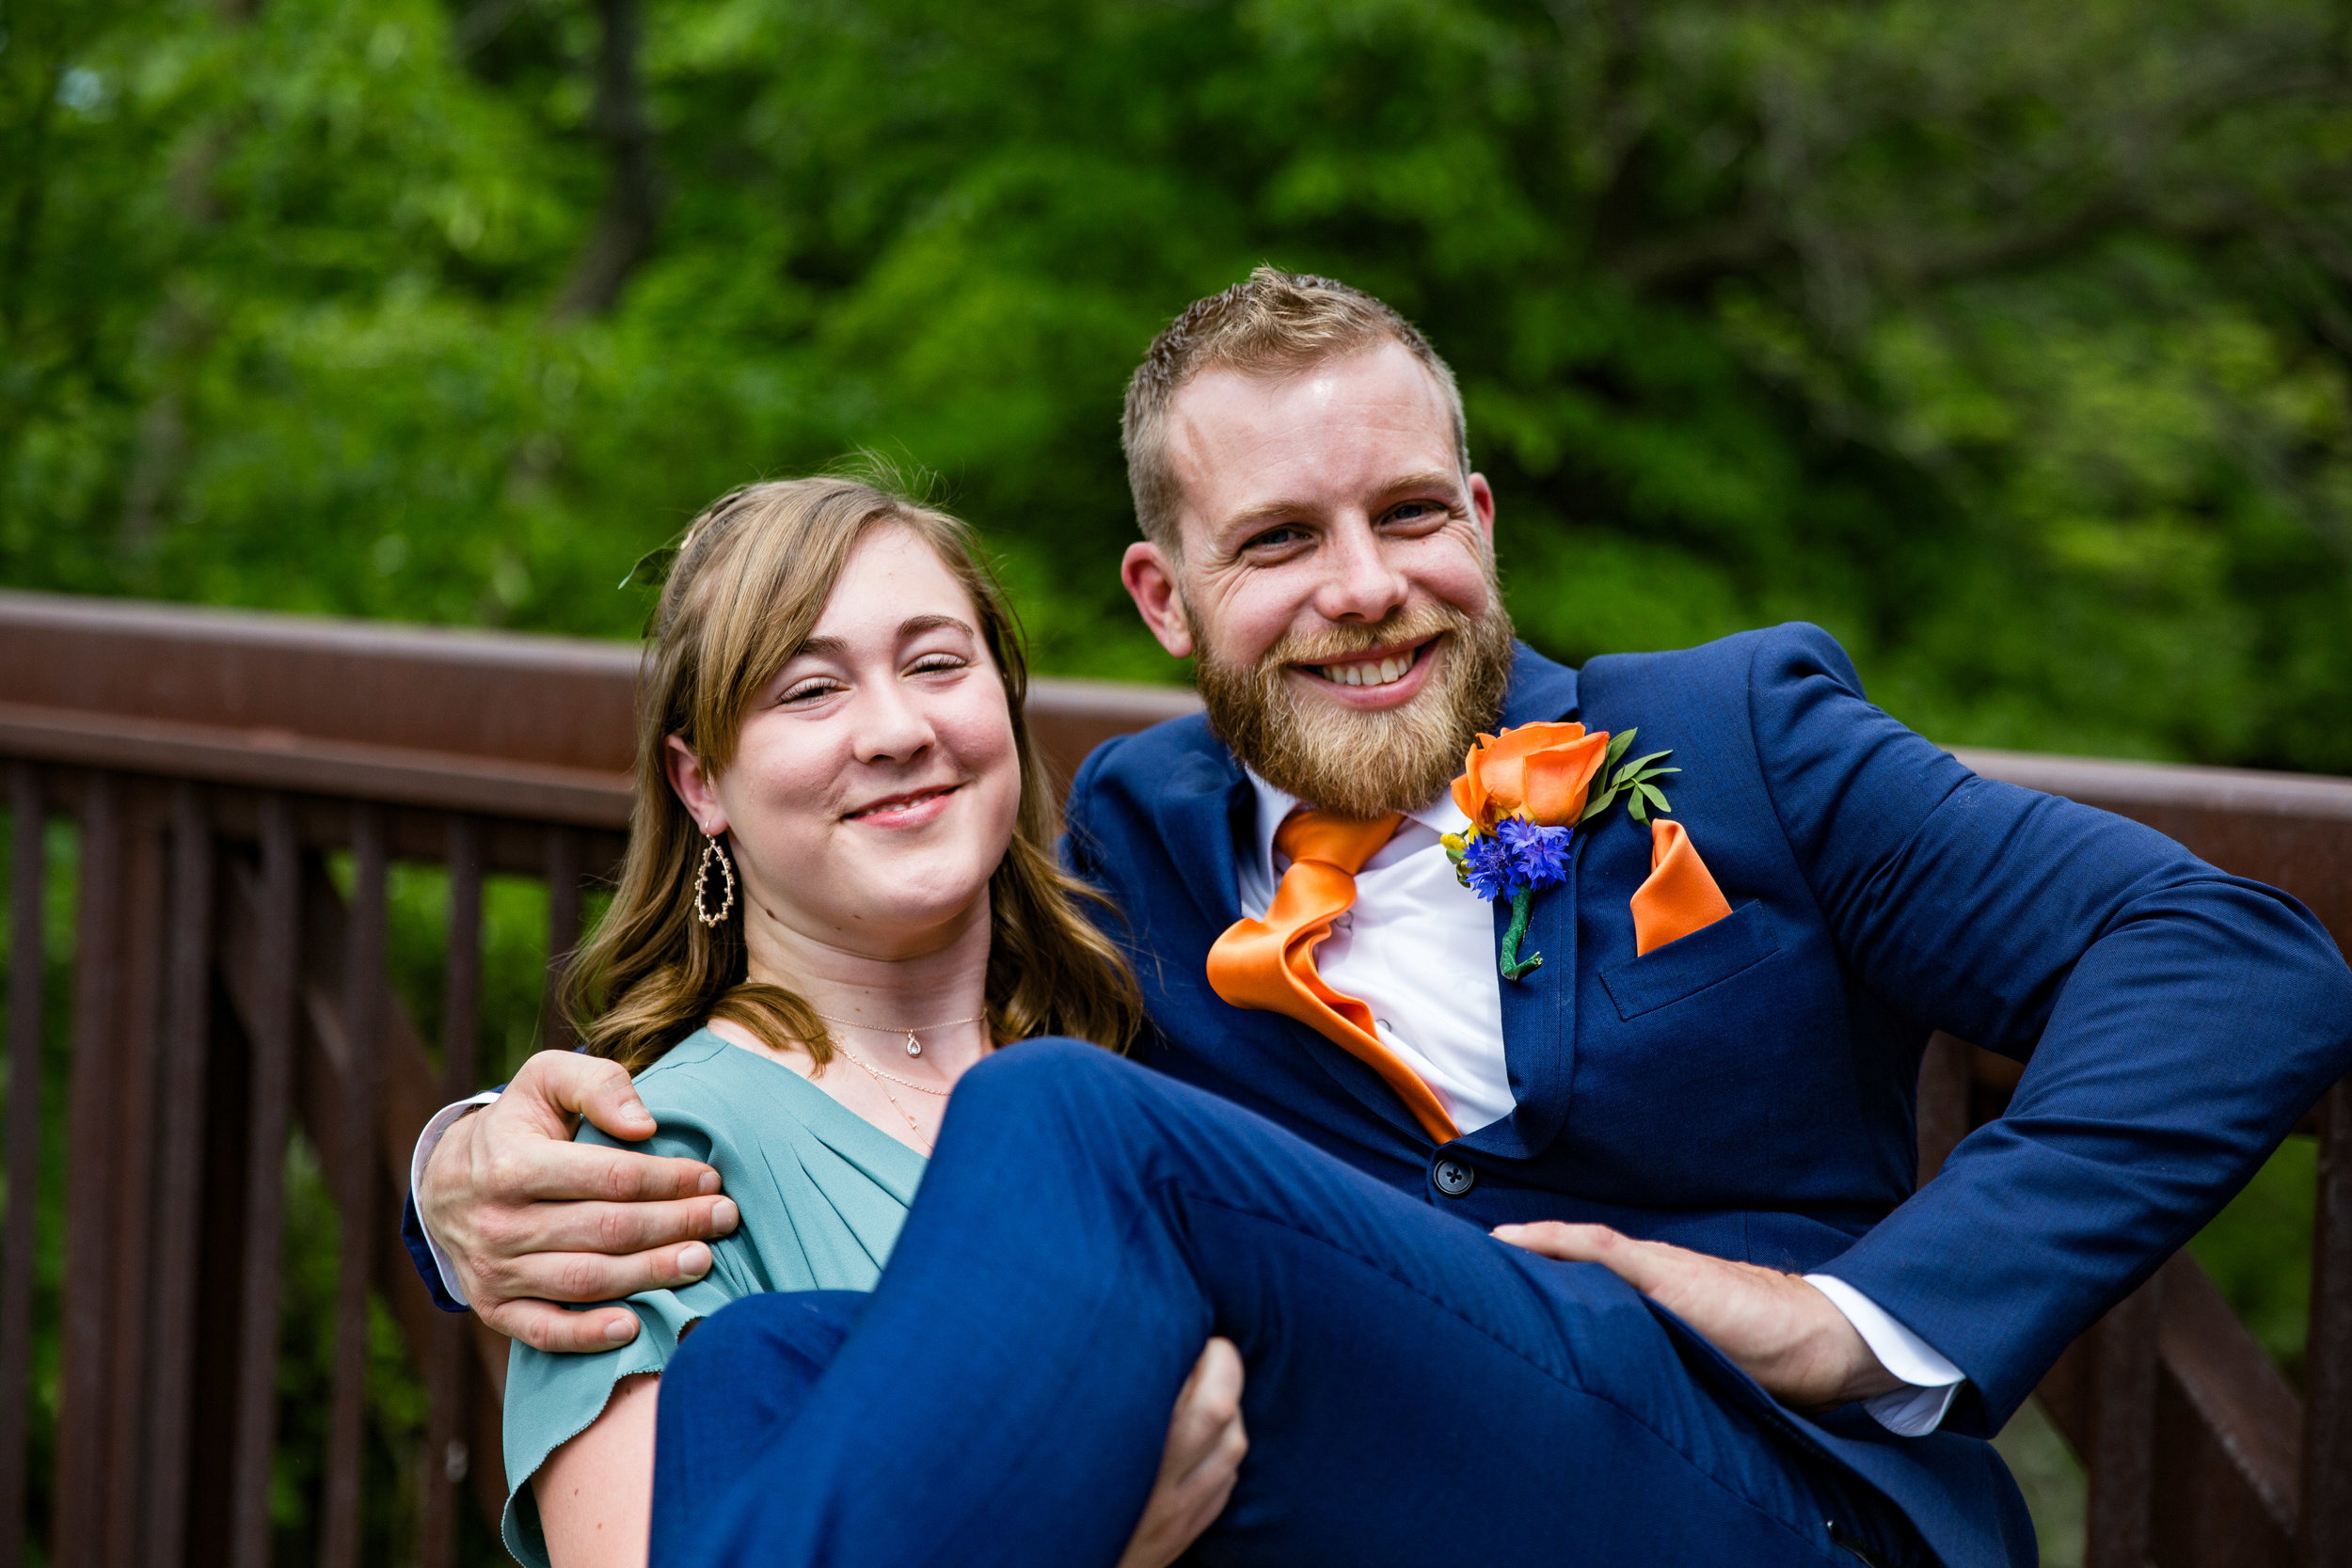 Natalie and Dallas Mooney Wedding 6-8-19_Tania Watt Photography-257.jpg